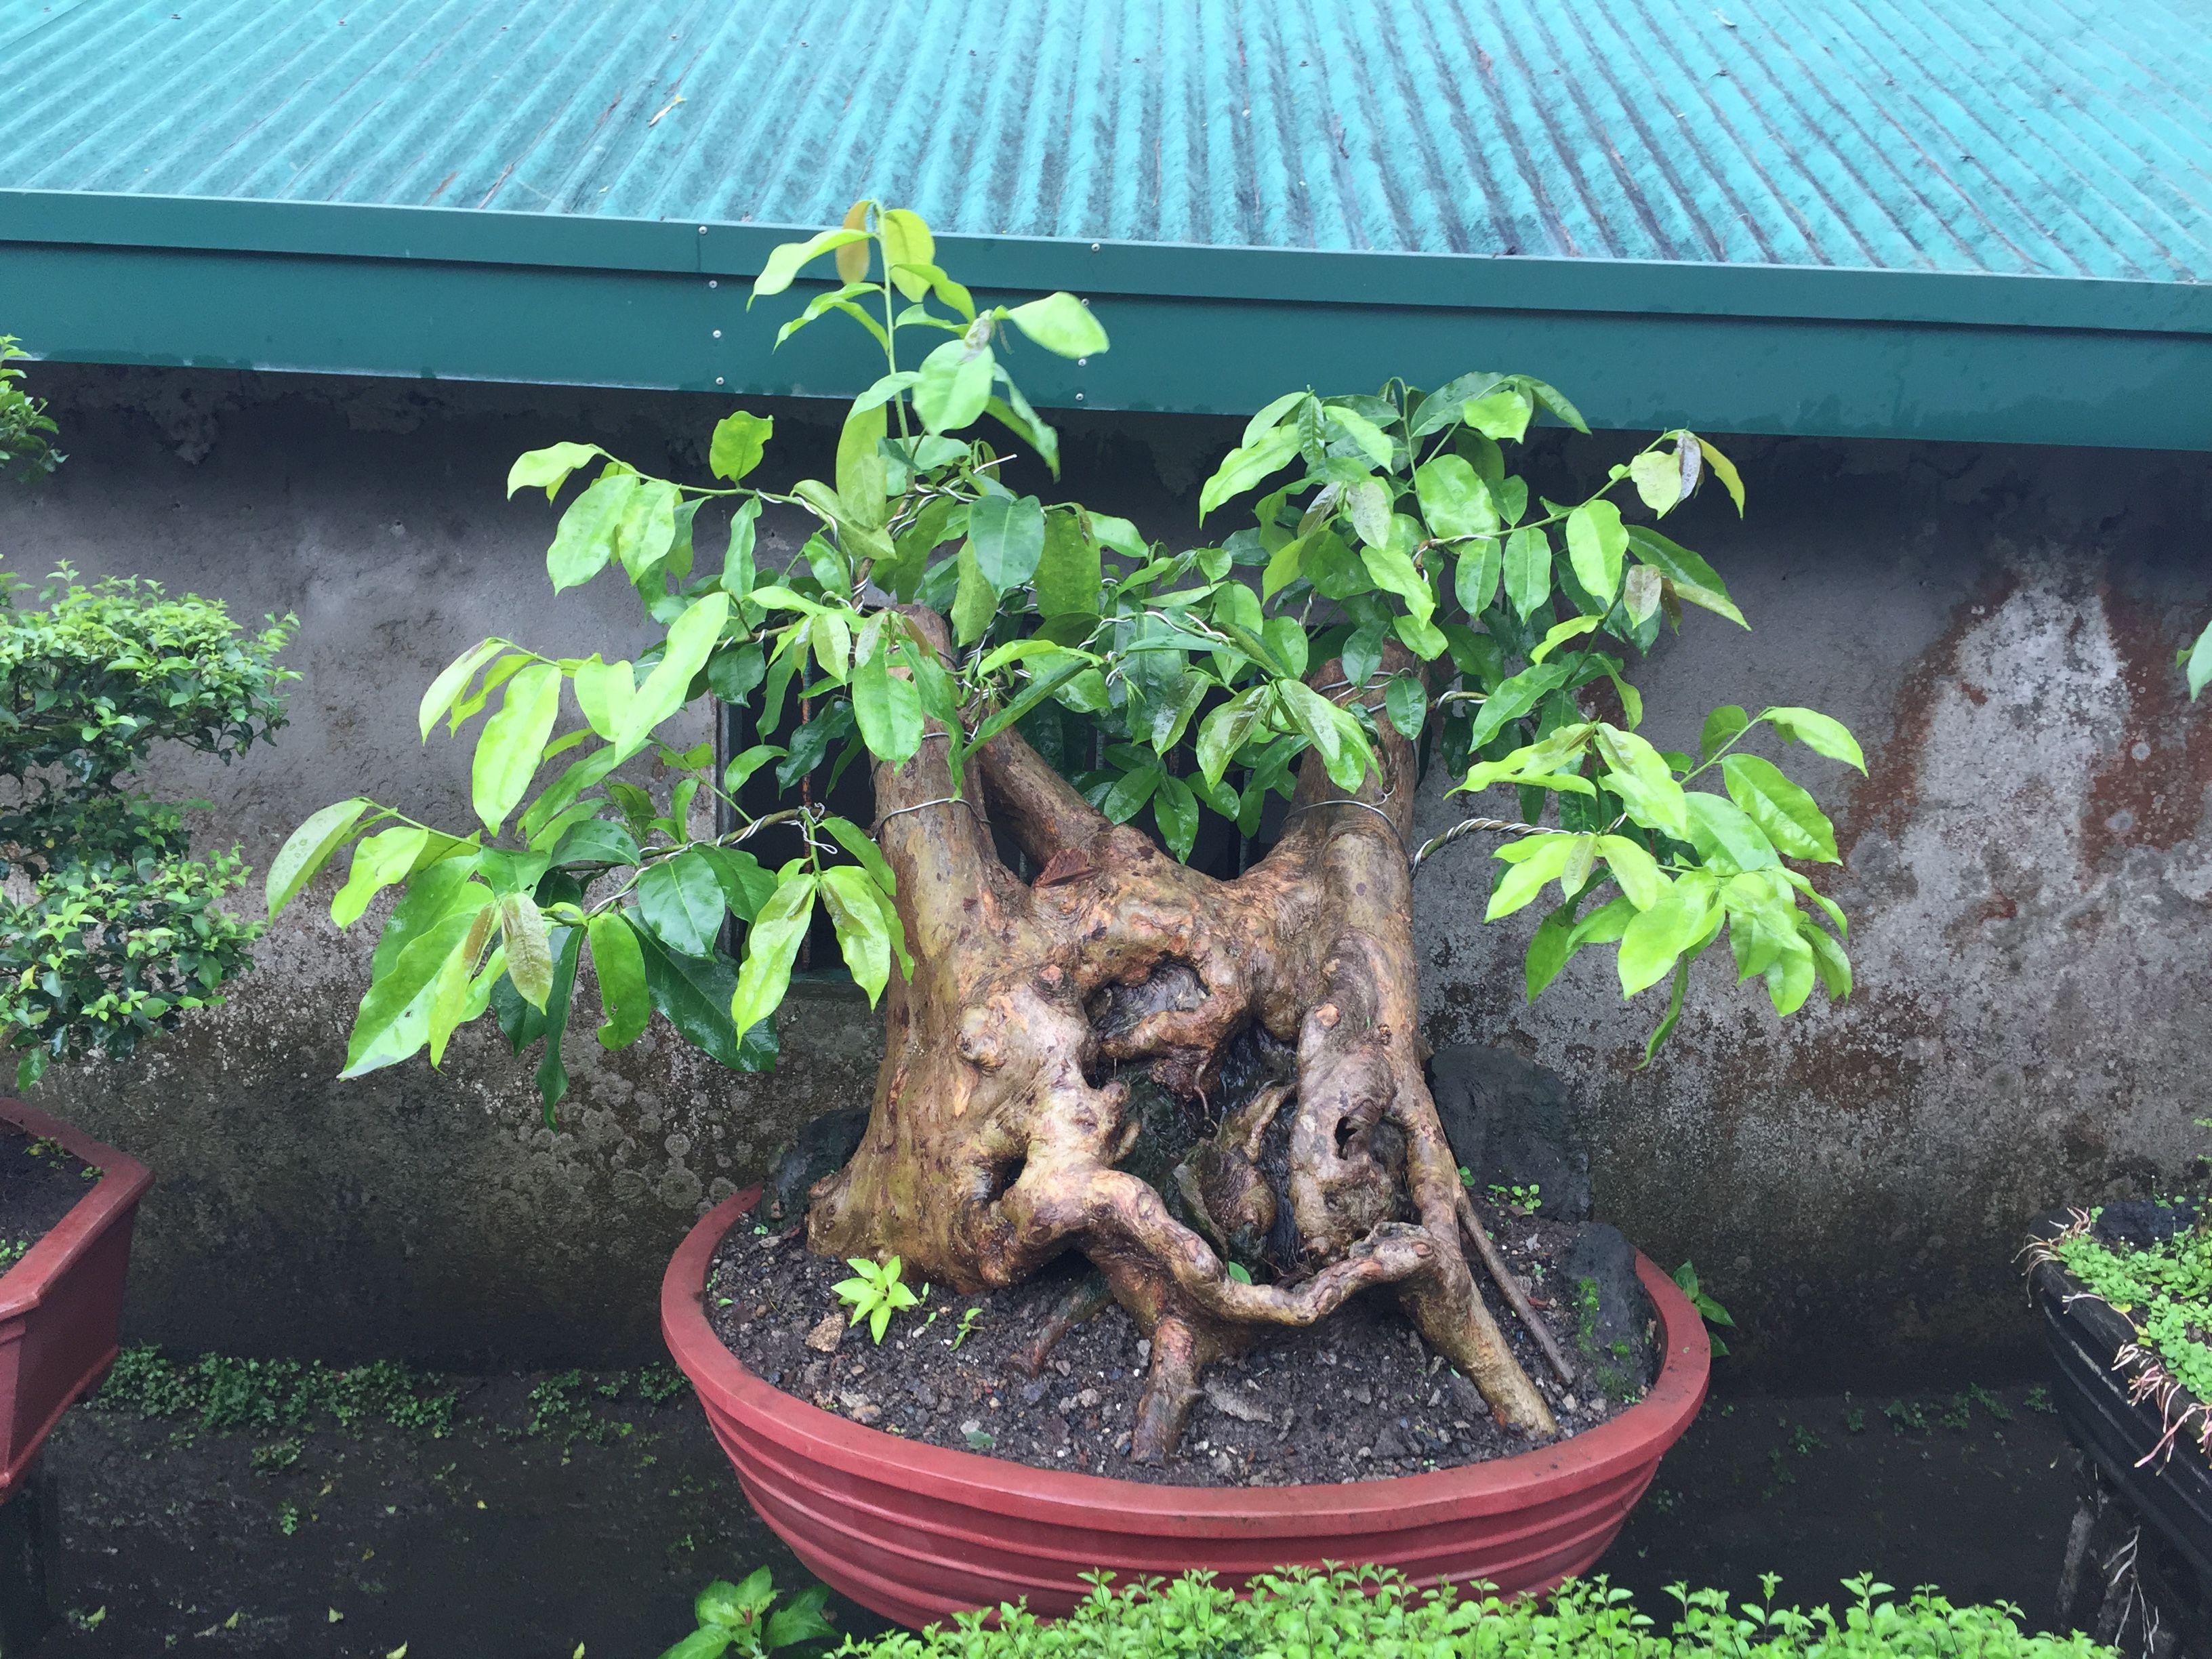 Roadside Bonsai Sales Tagaytay Philippines Bonsai Plants Bonsai Bougainvillea Bonsai